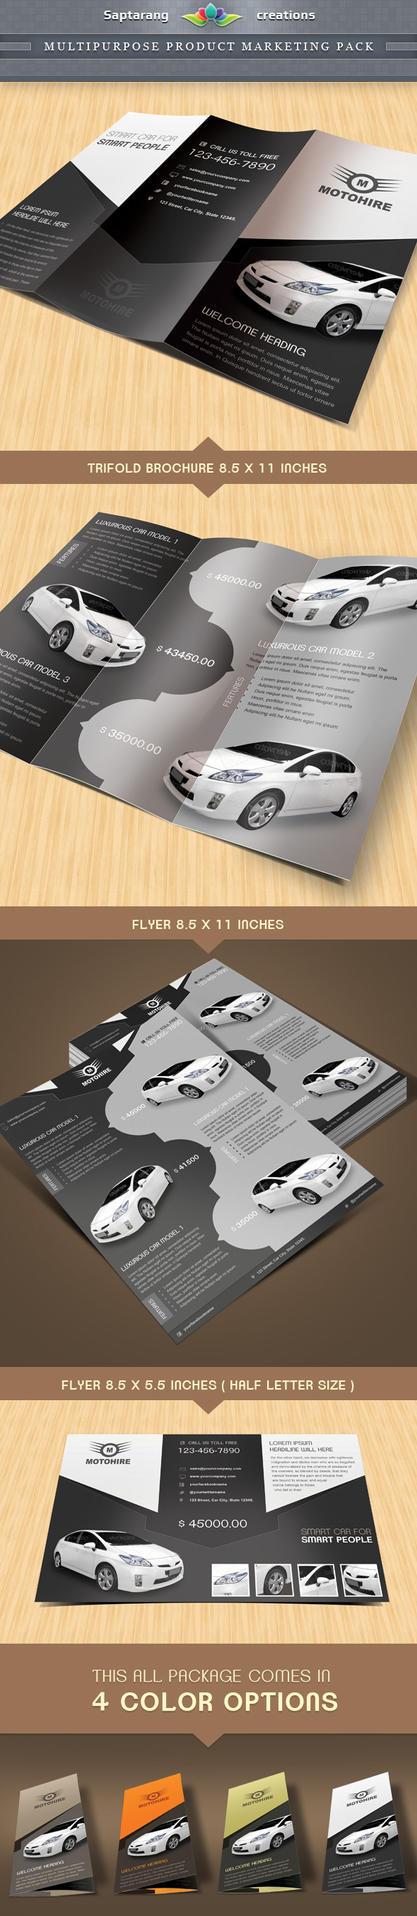 Multipurpose Product Marketing Package by Saptarang